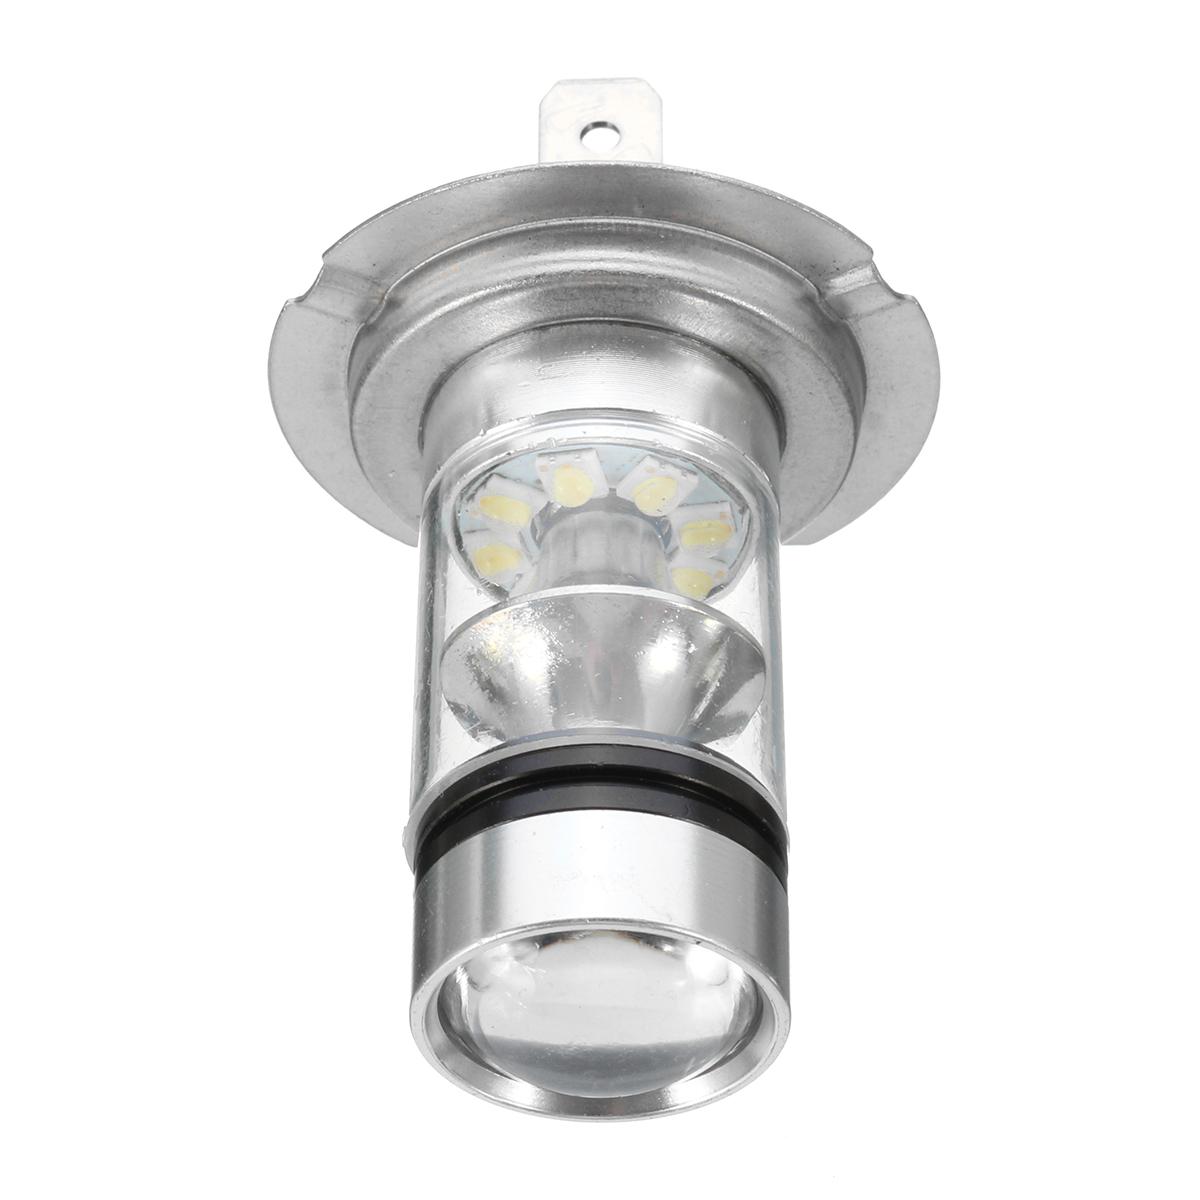 2X 100W 12-24V H7 LED Фары Противотуманные хвостовые ксеноновые лампы - фото 4